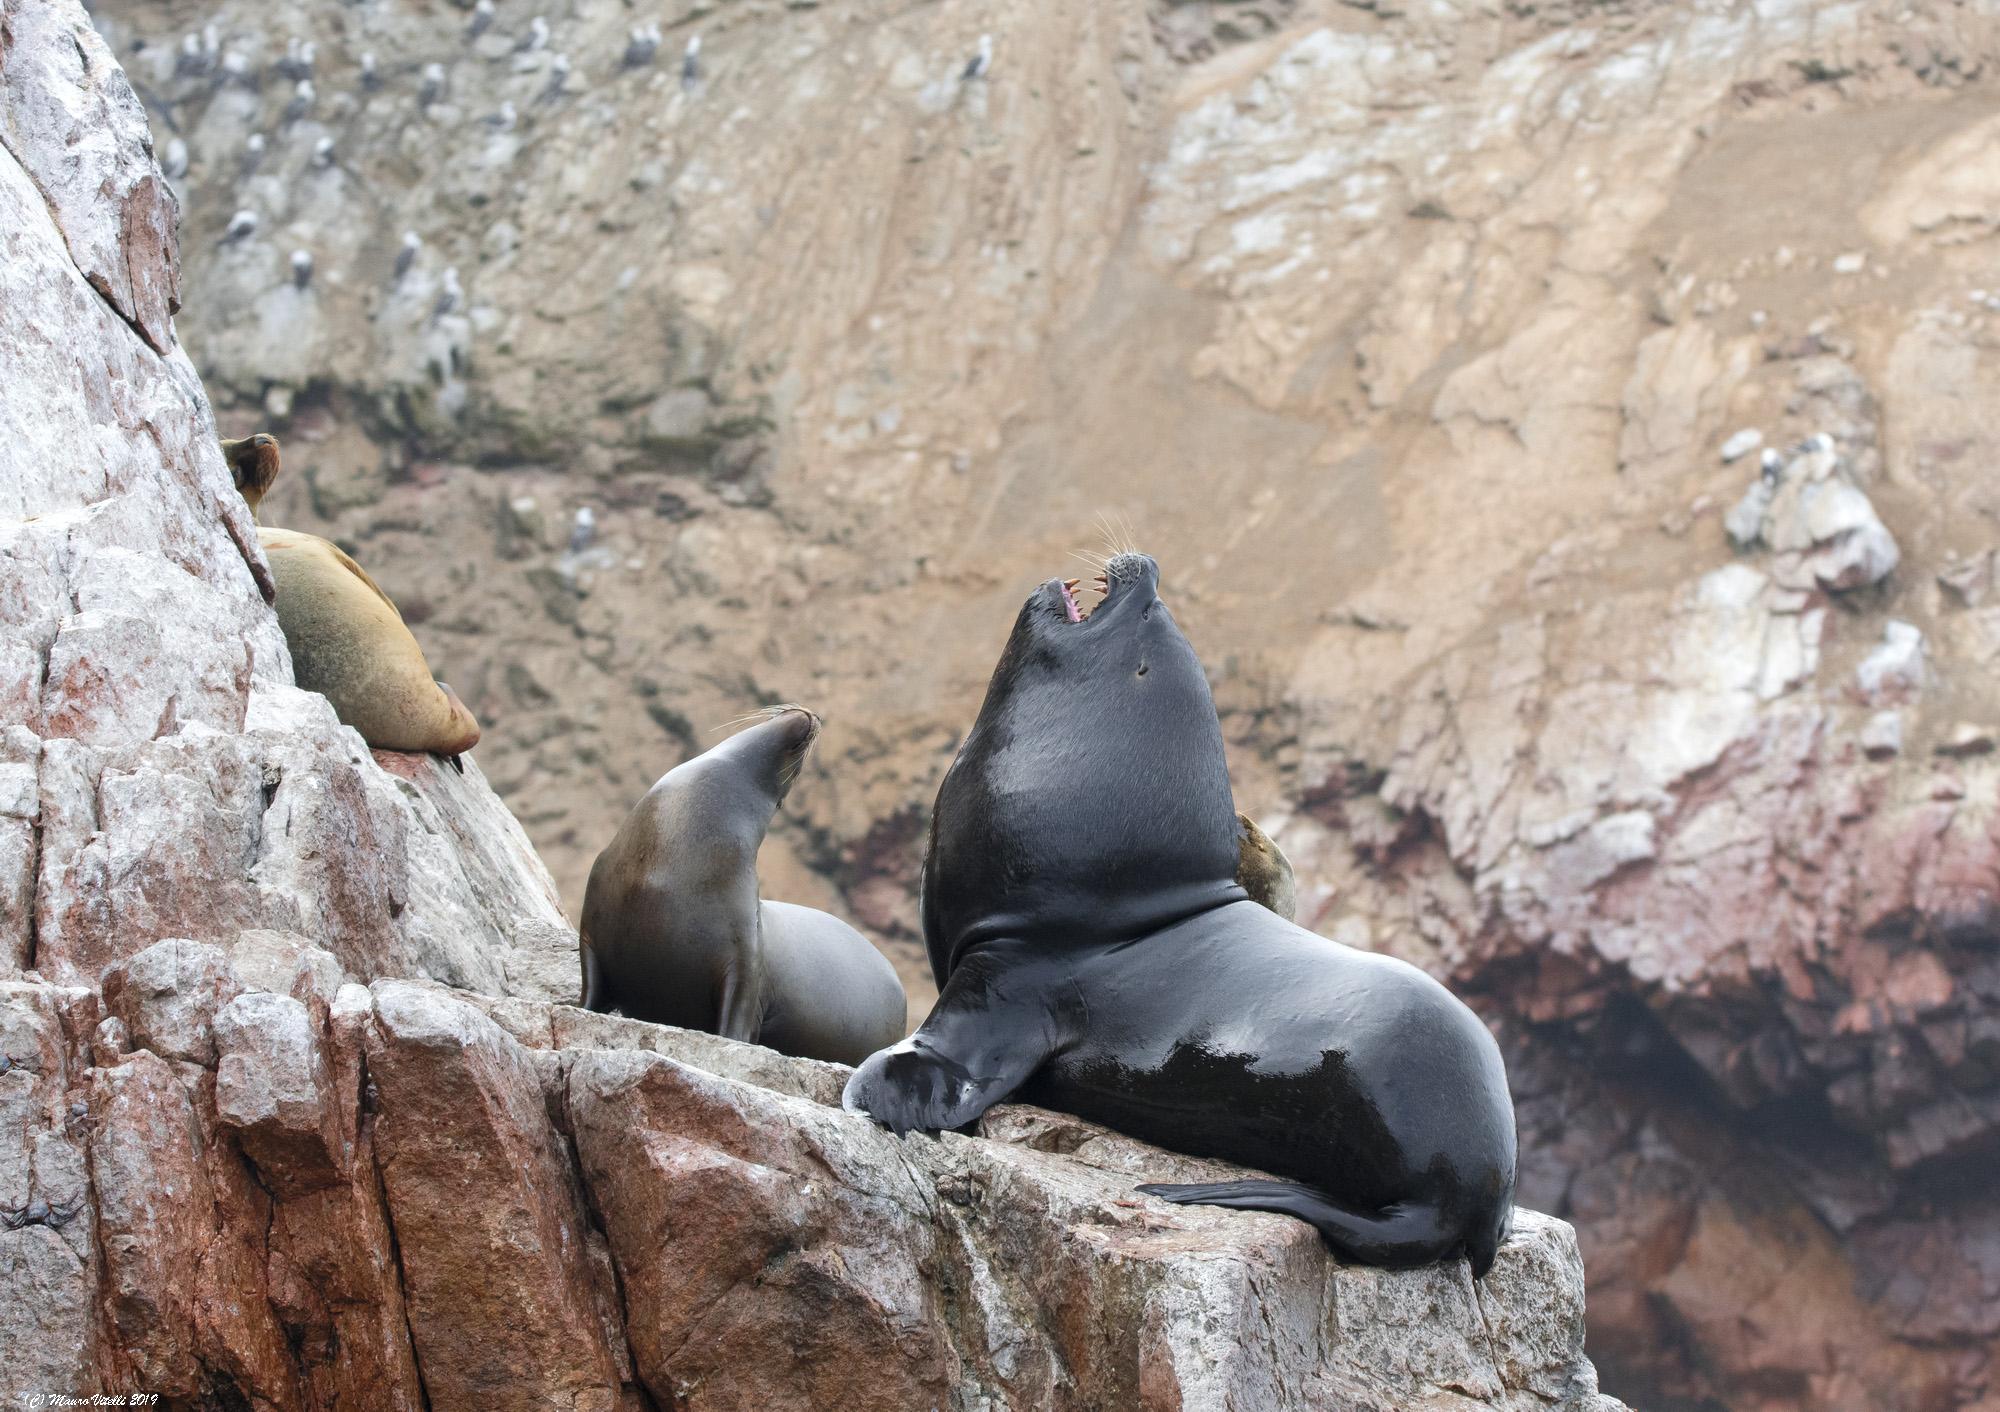 Leoni Marini Isole Ballestas Perù...